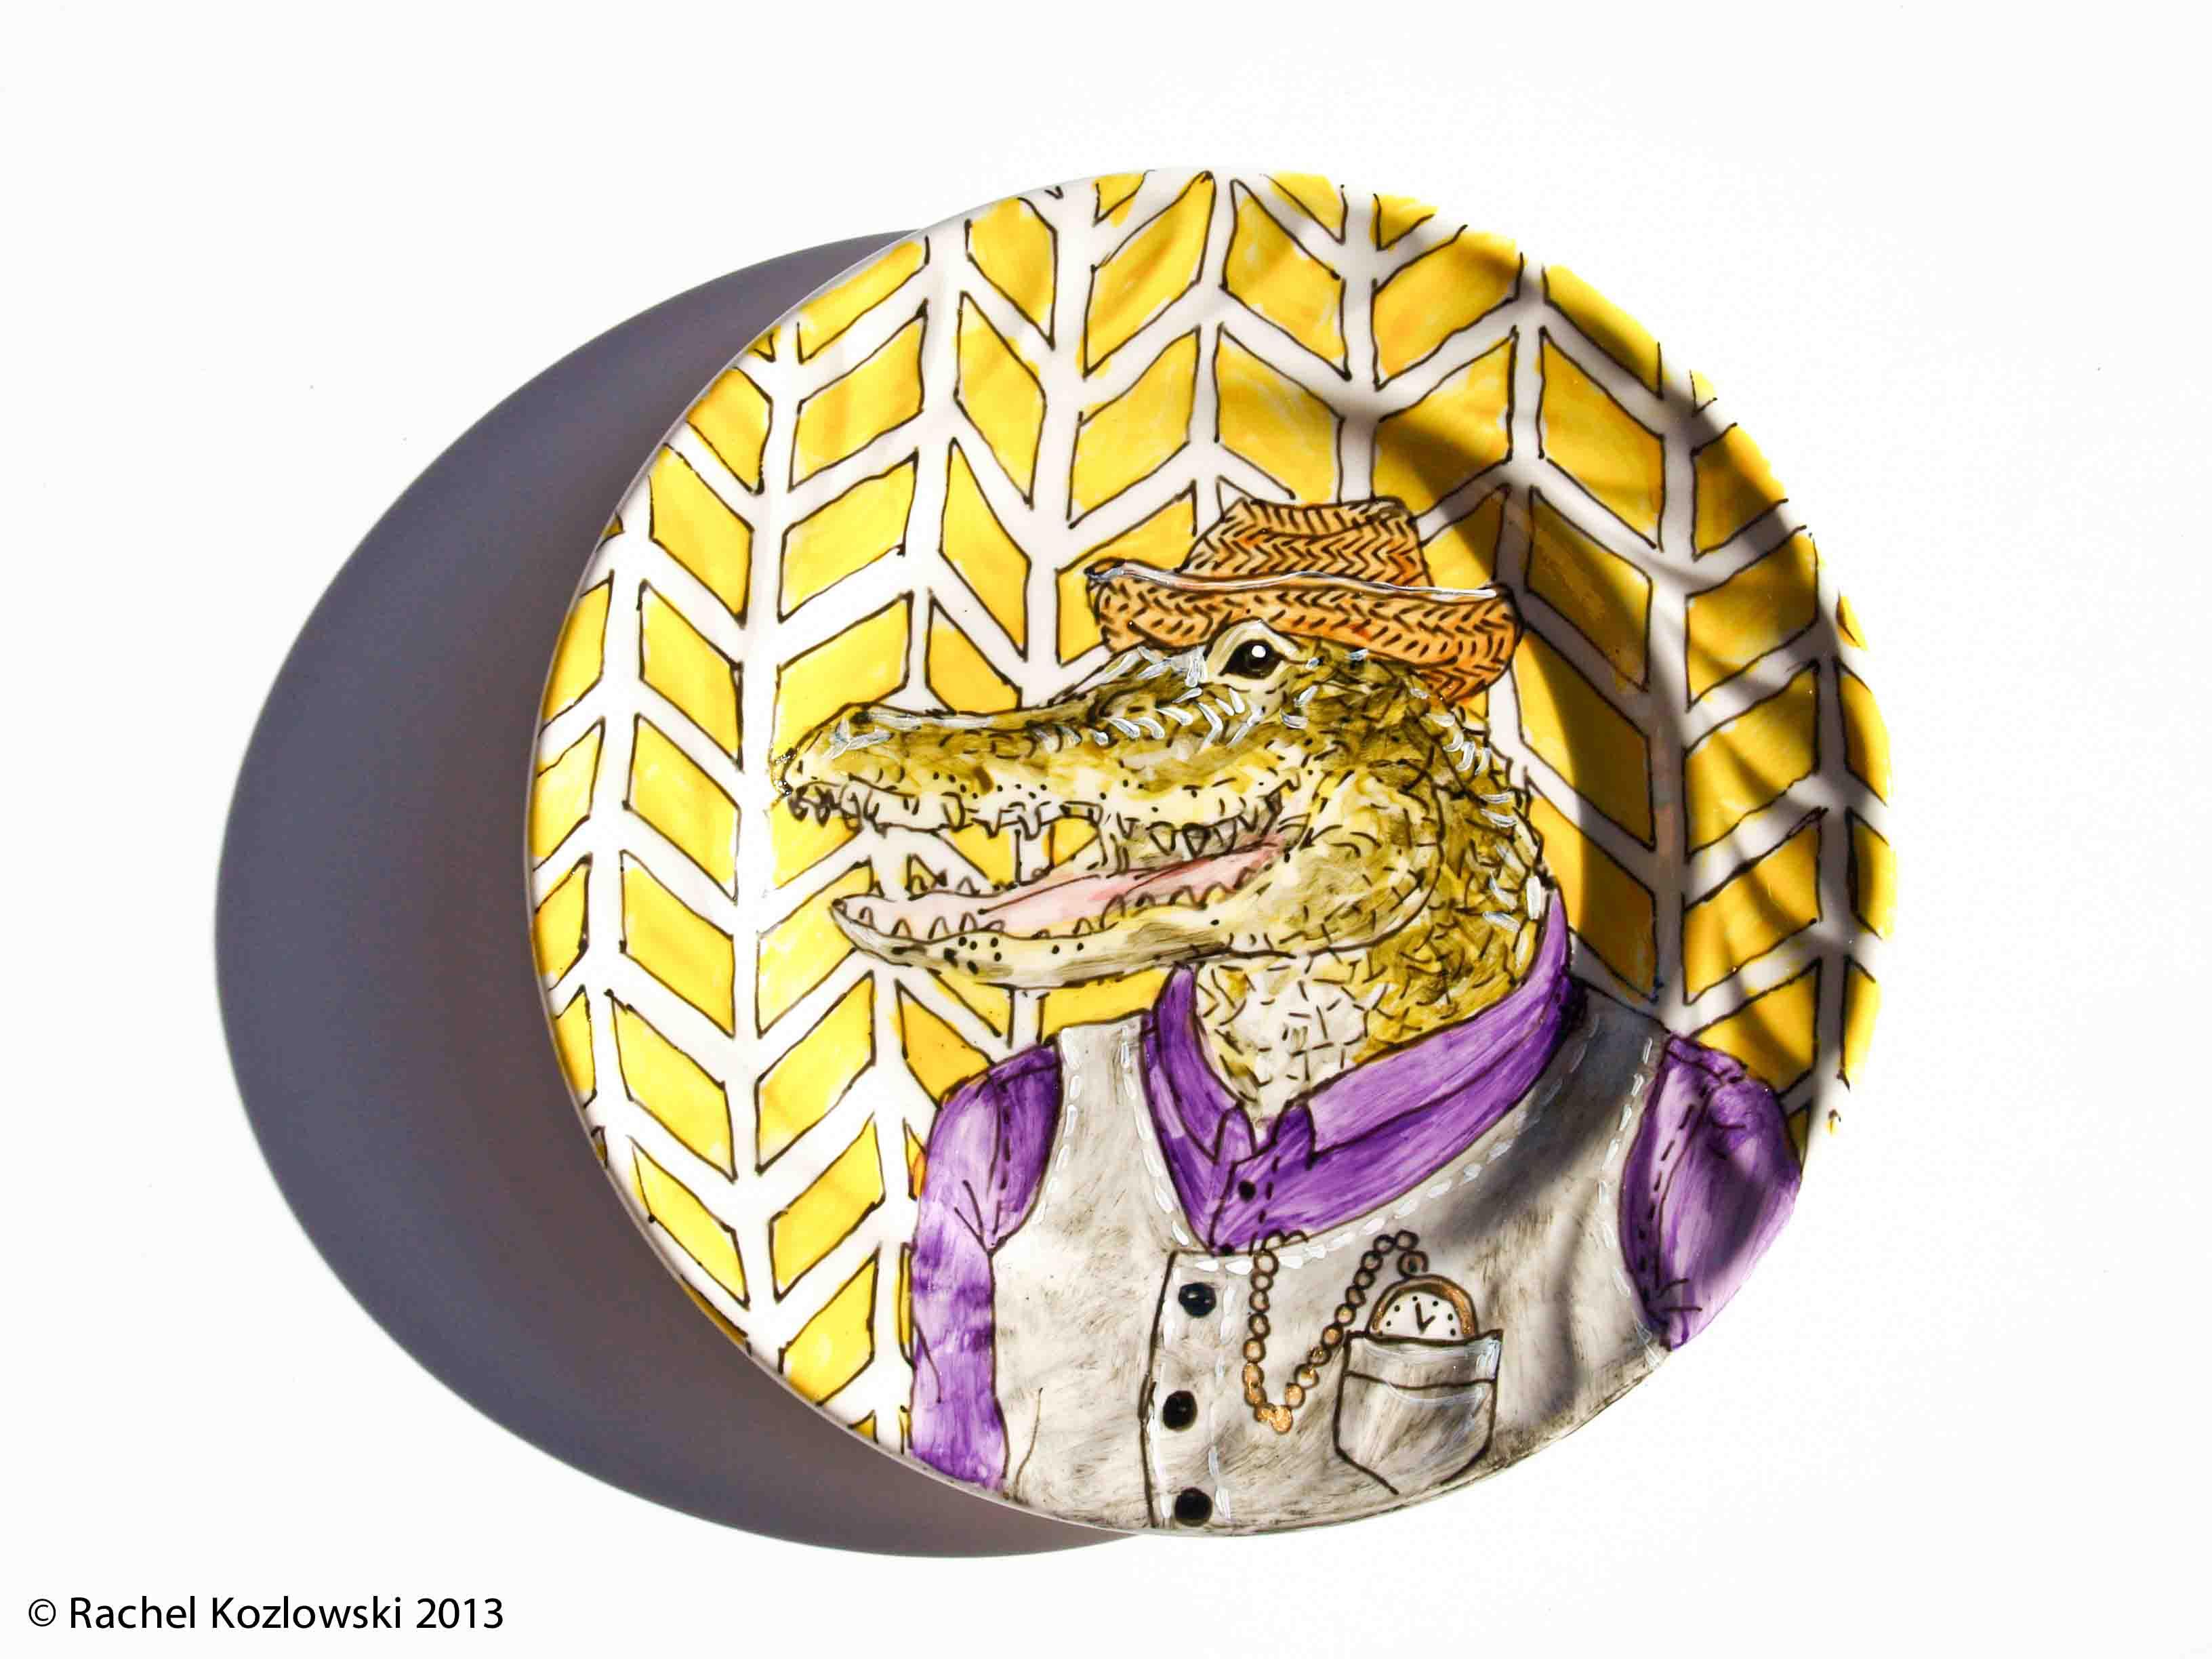 Alligator Plate